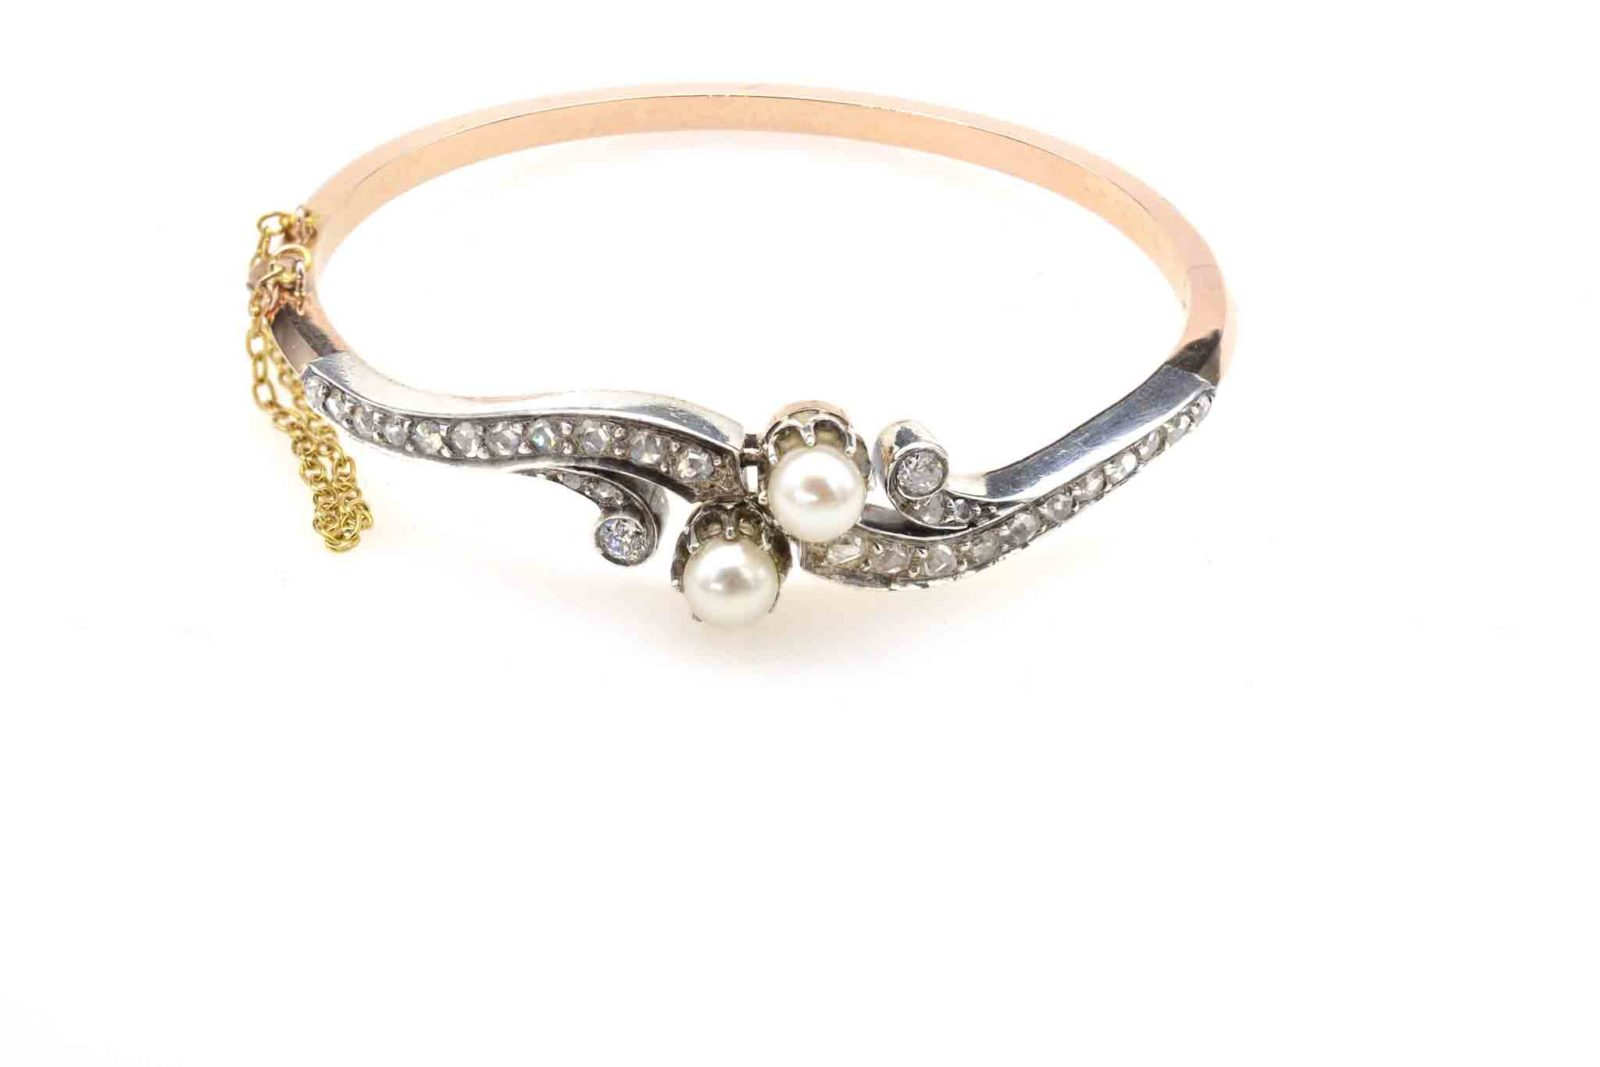 Bracelet ancien diamants perles